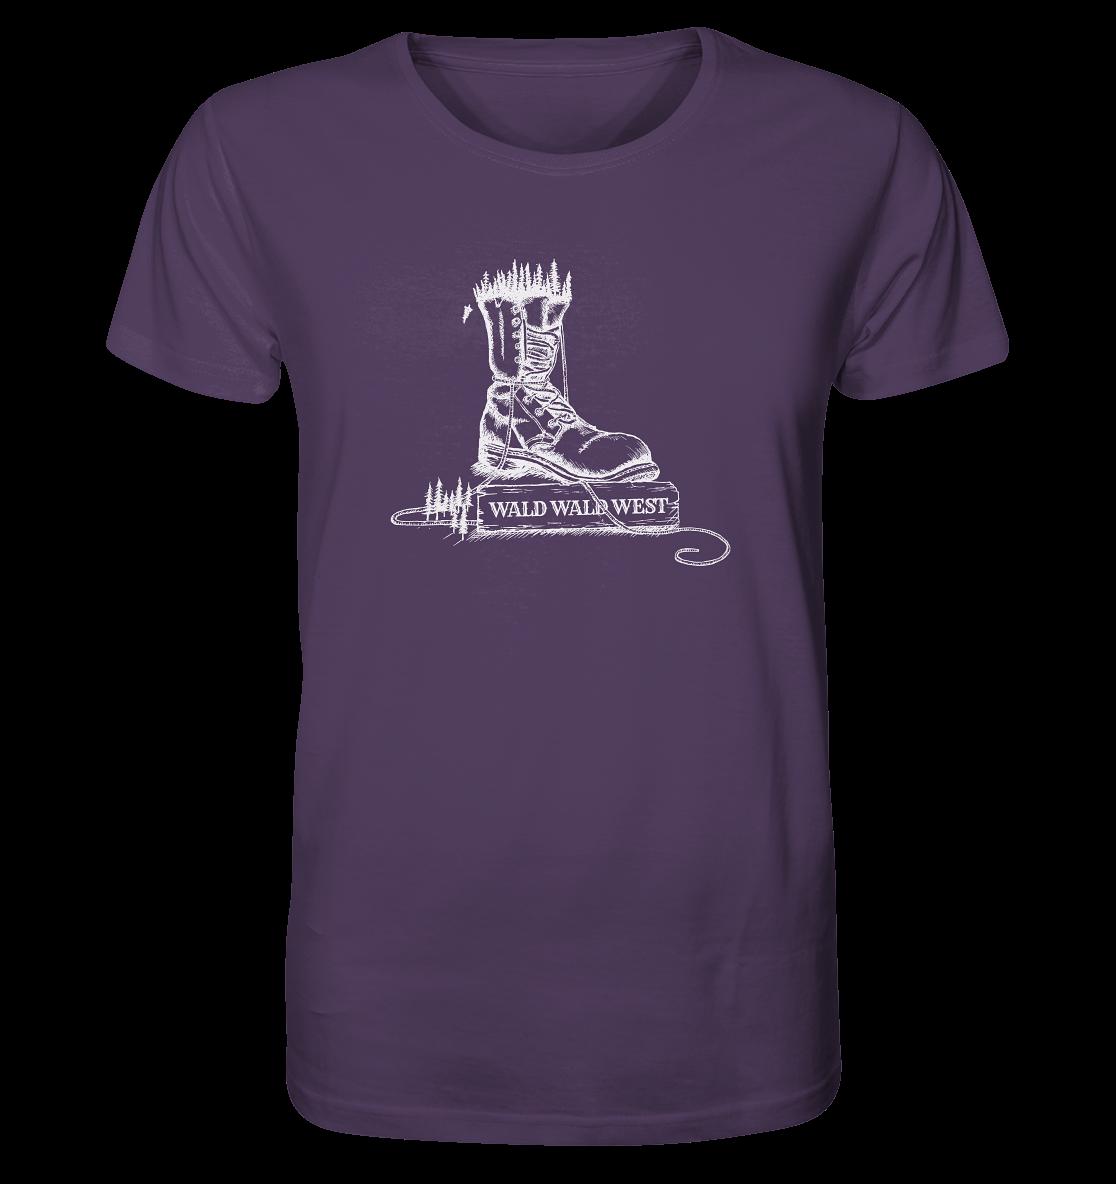 front-organic-shirt-523f5f-1116x.png